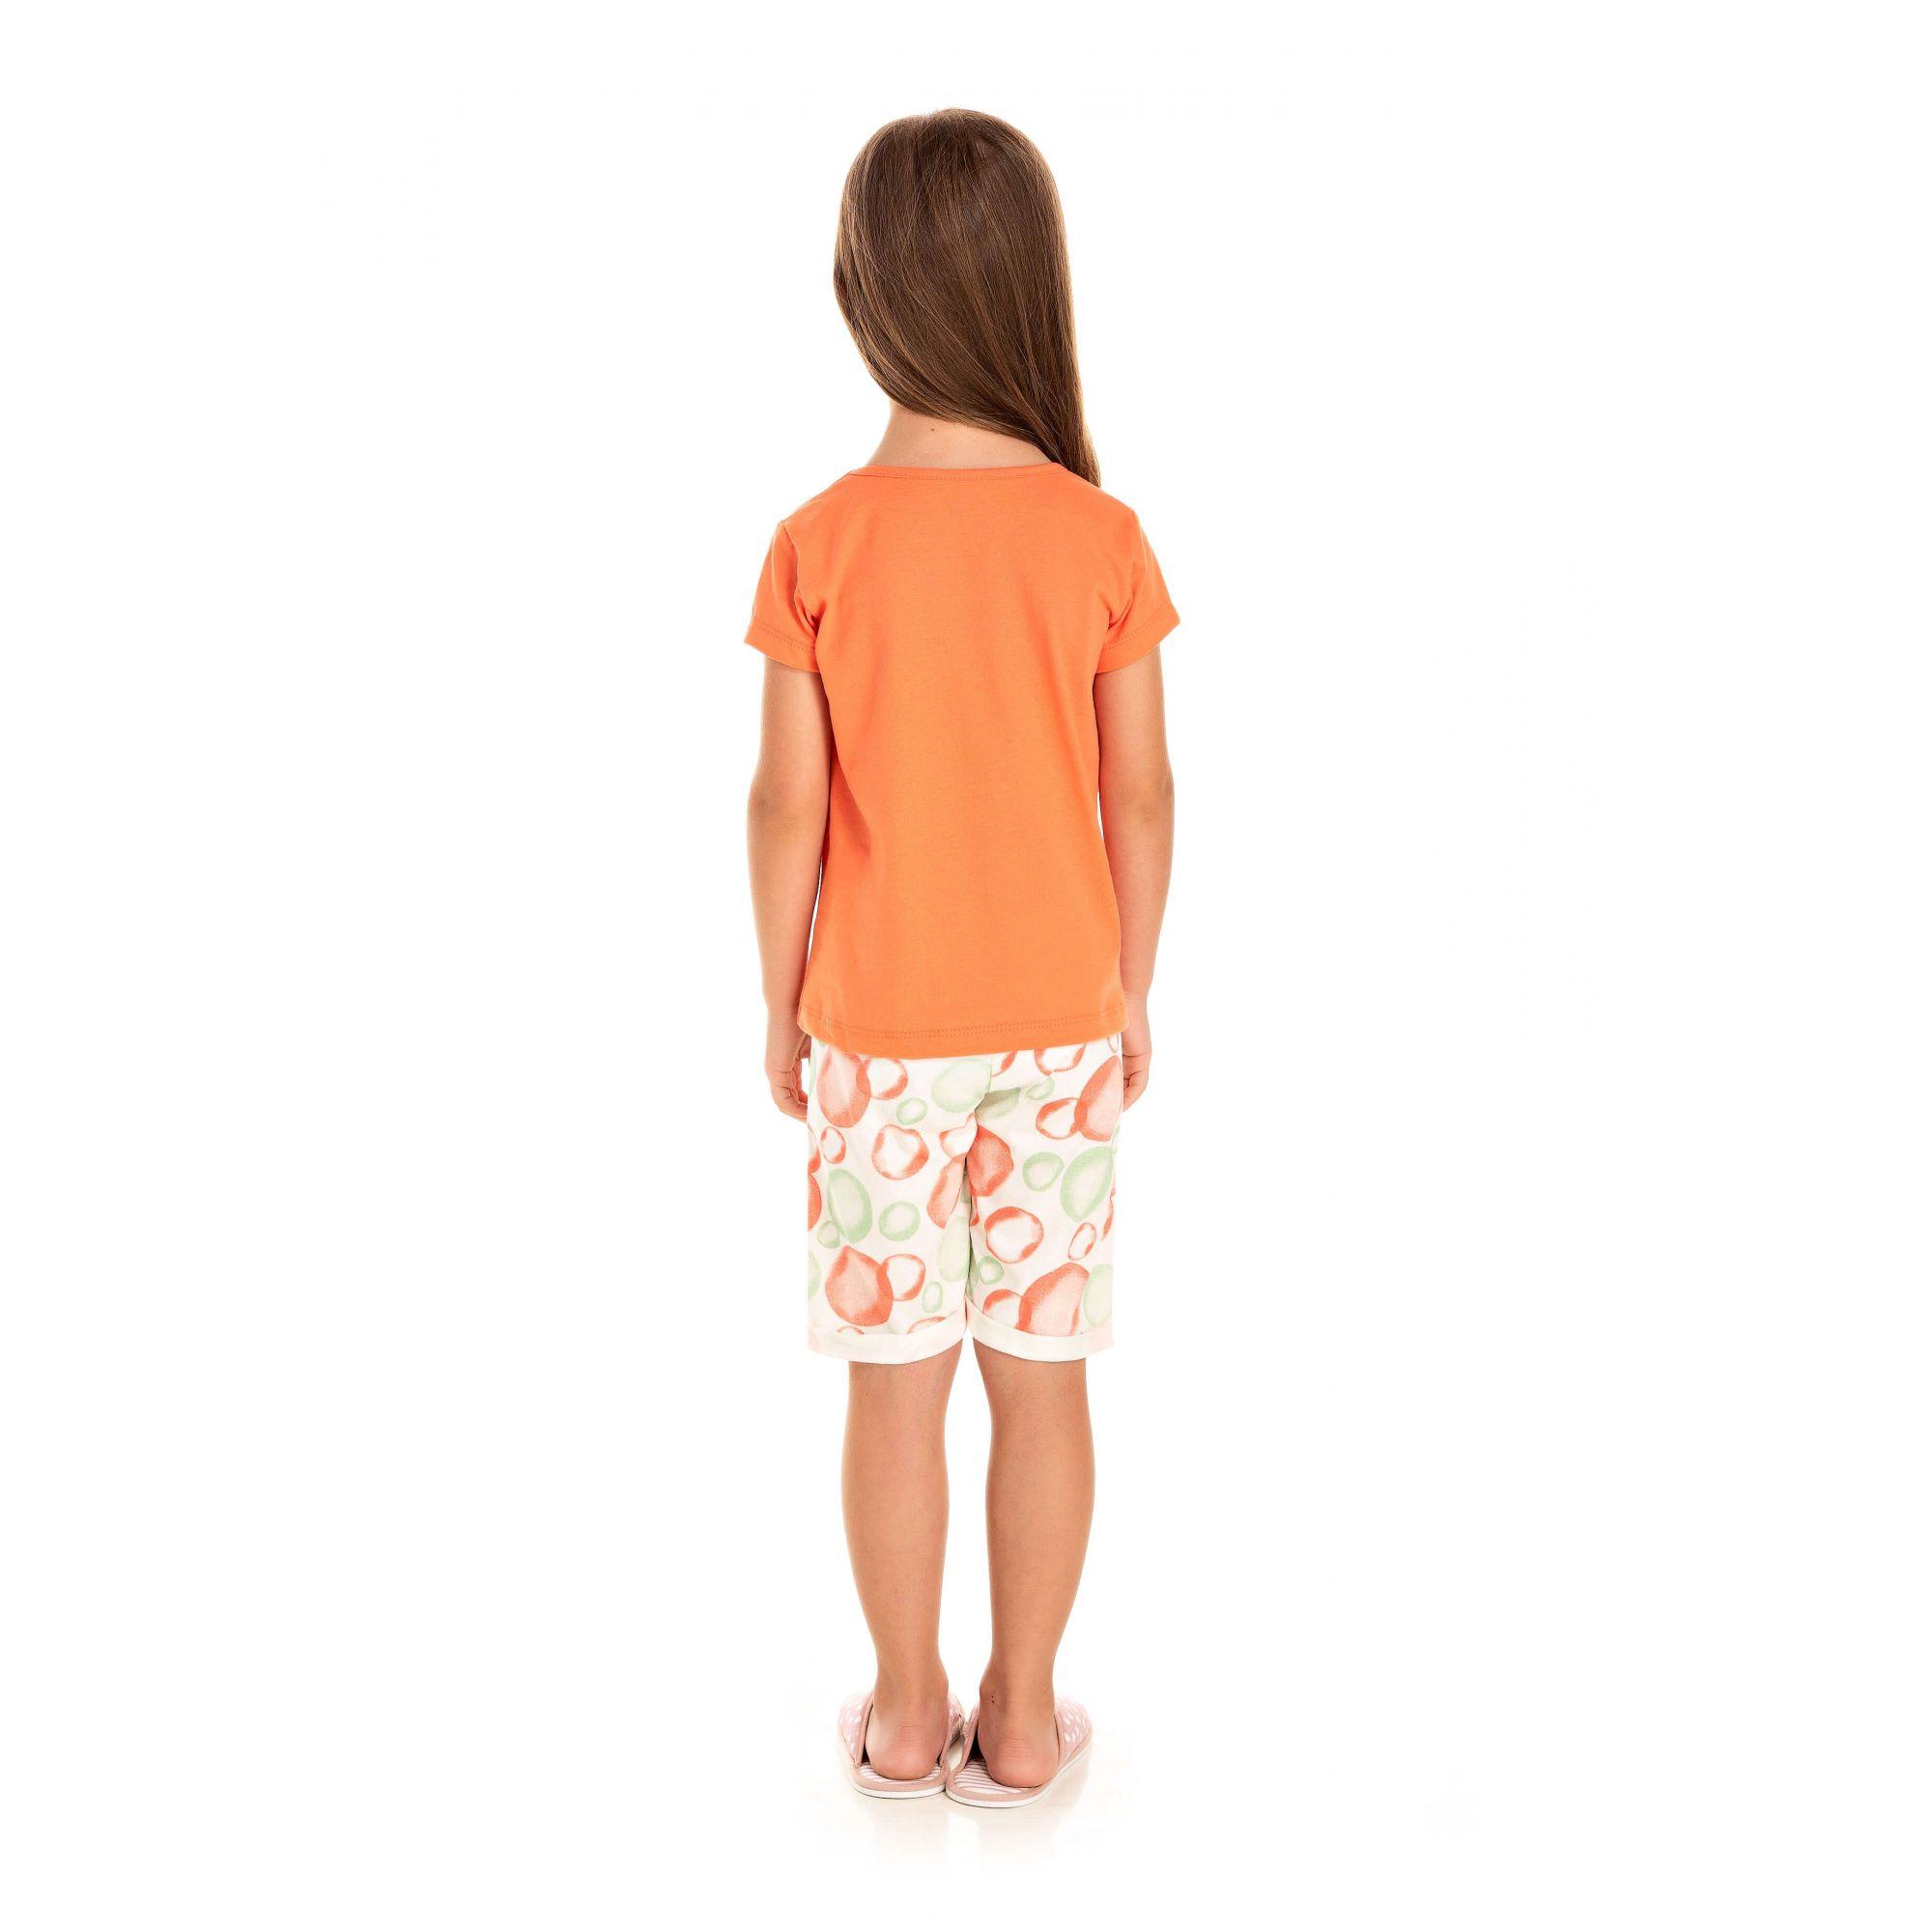 206/L - Short Doll Infantil Feminino Água Viva